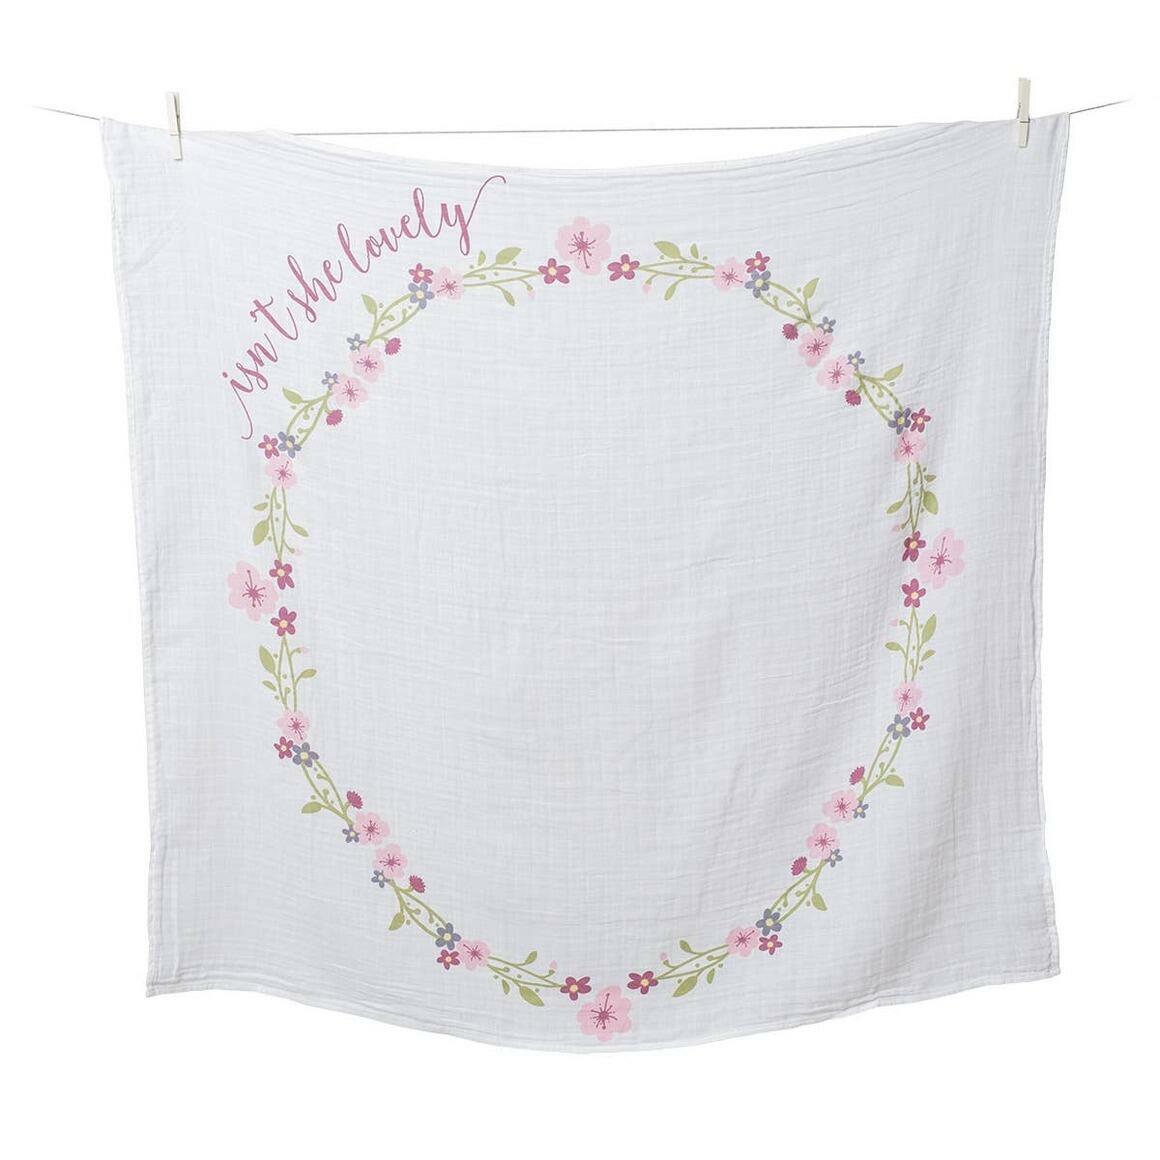 Single Cotton Swaddle & Cards - Isn't she Lovely   Trada Marketplace